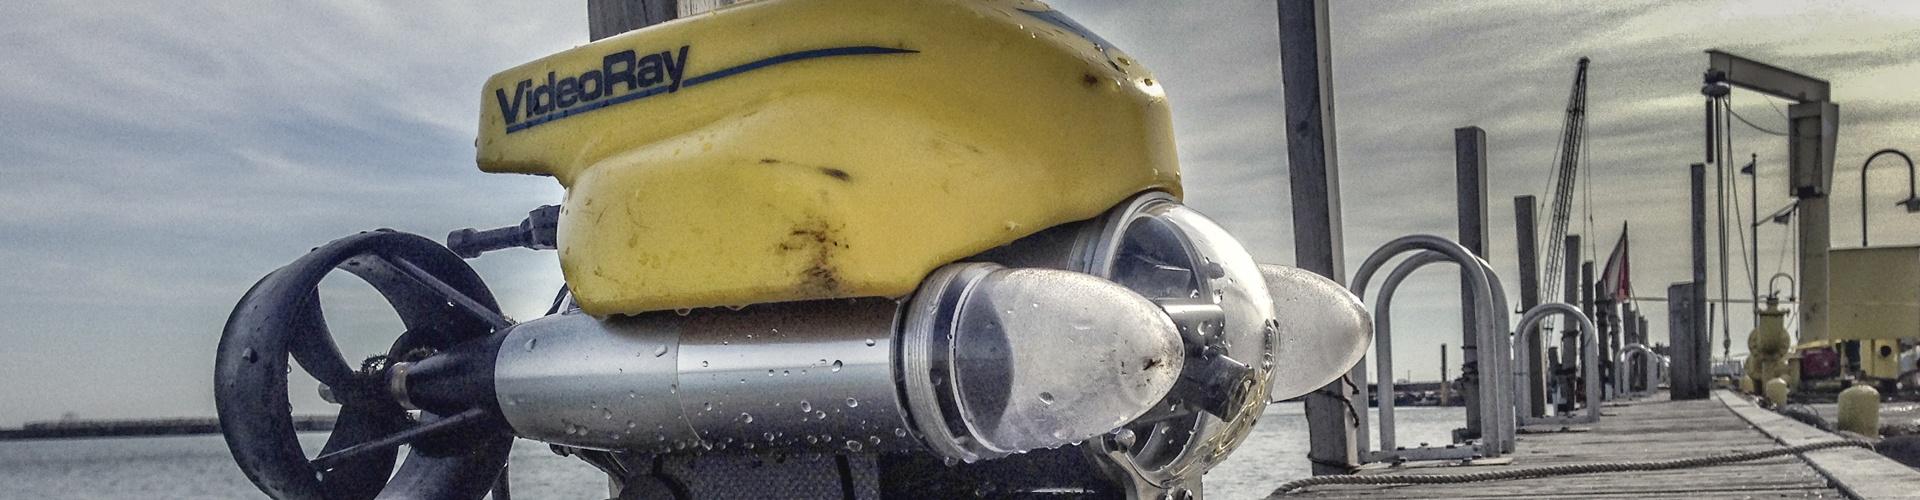 underwater inspections, railroad bridge, railroad bridges, rov units, rov inspections